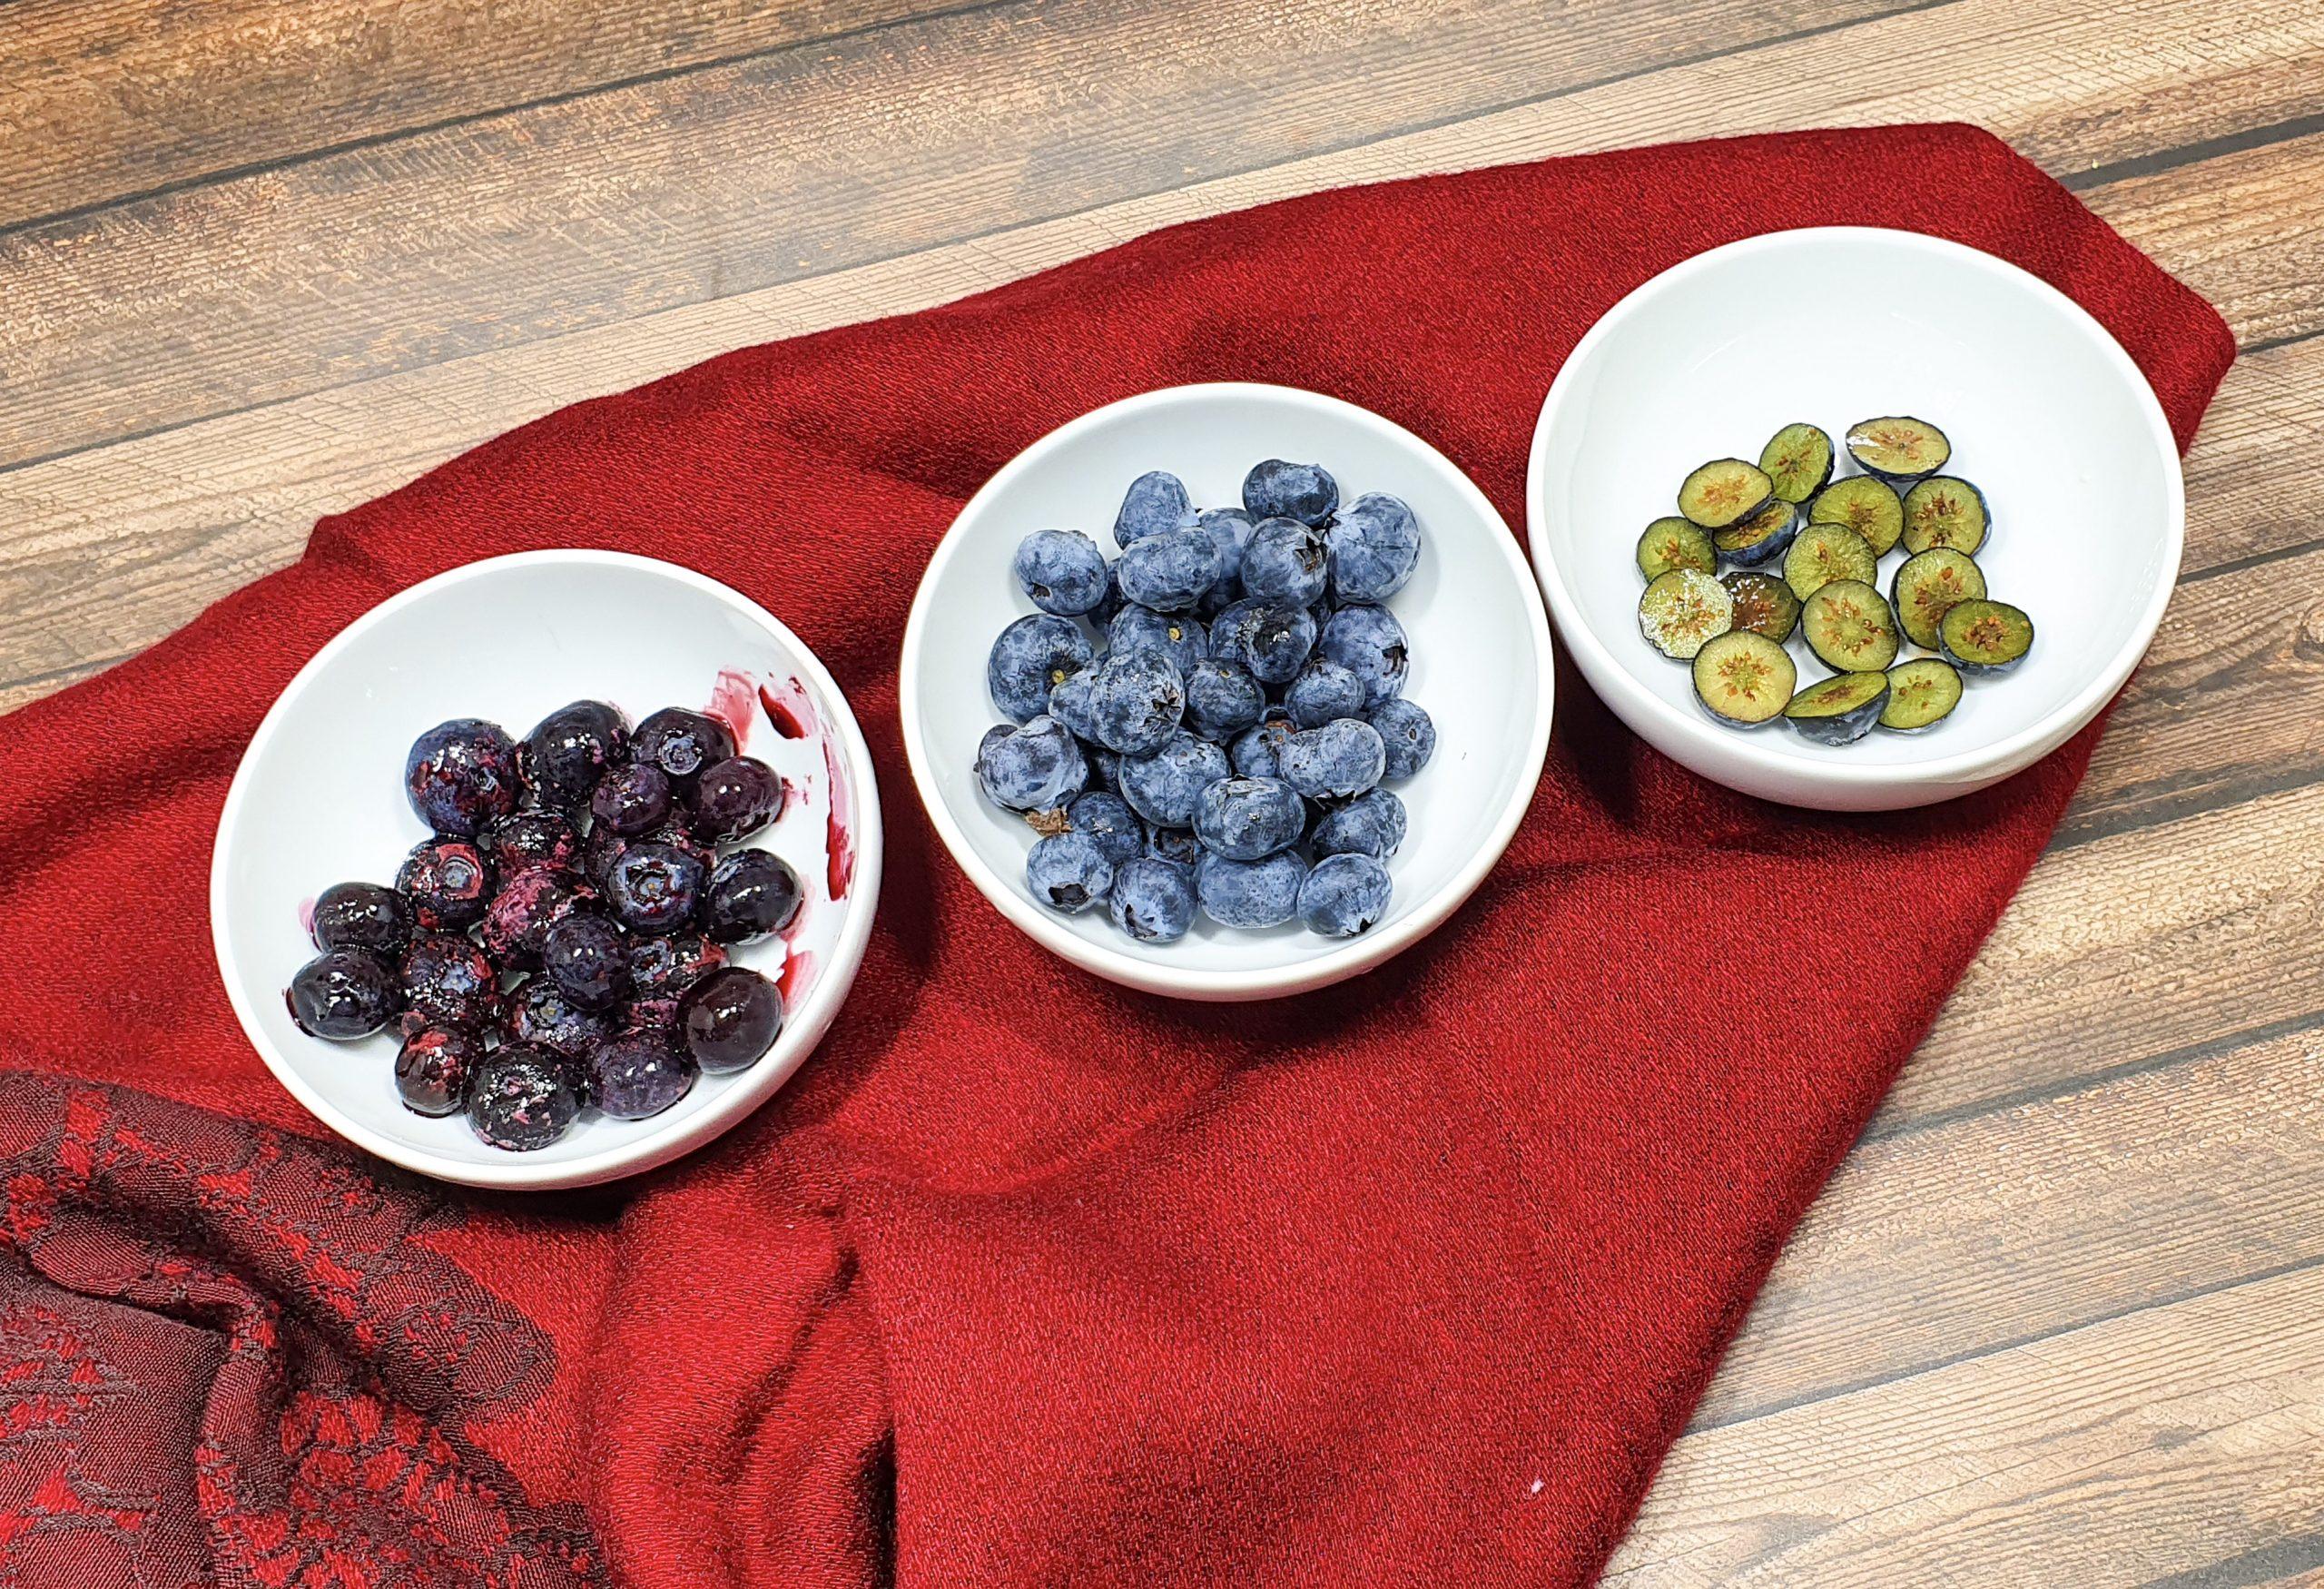 Frozen, fresh and sliced blueberries